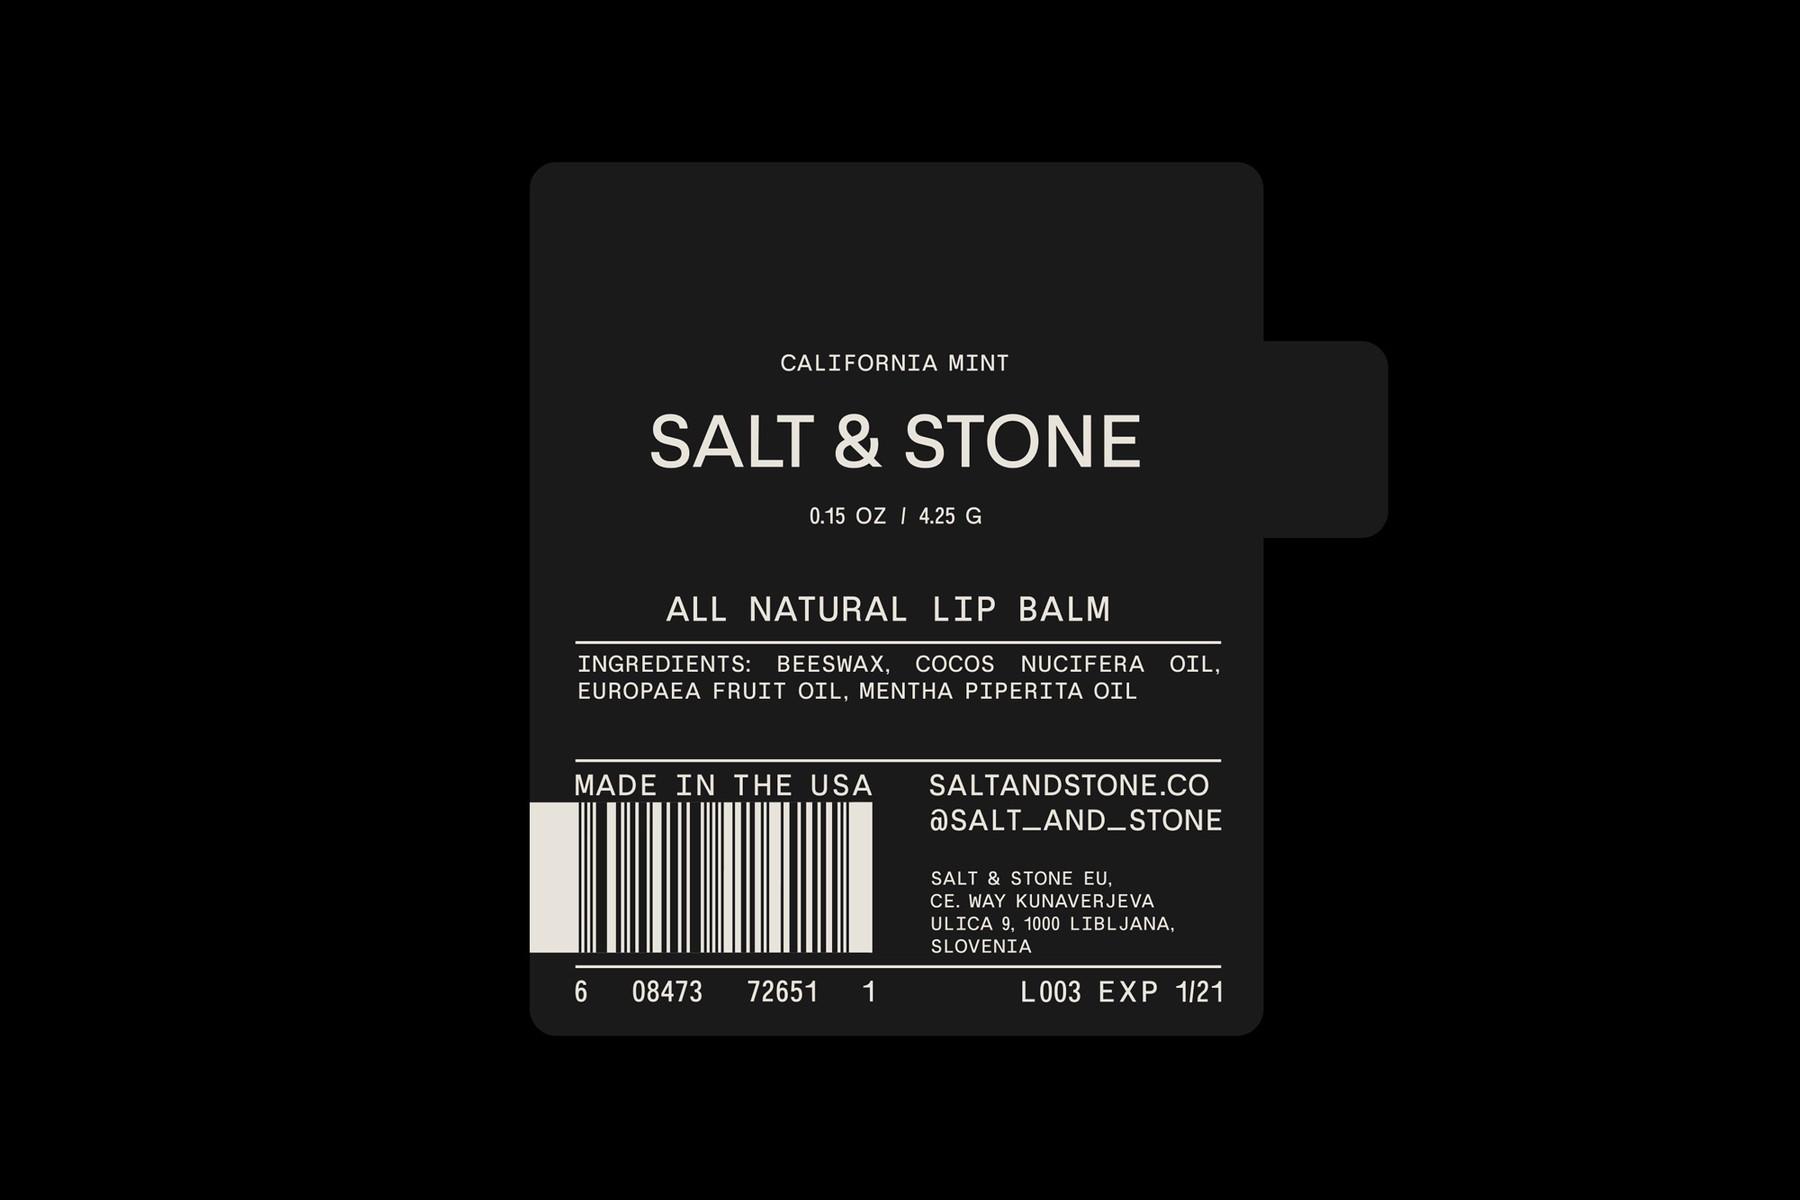 salt_stone_pack_web_03.jpg